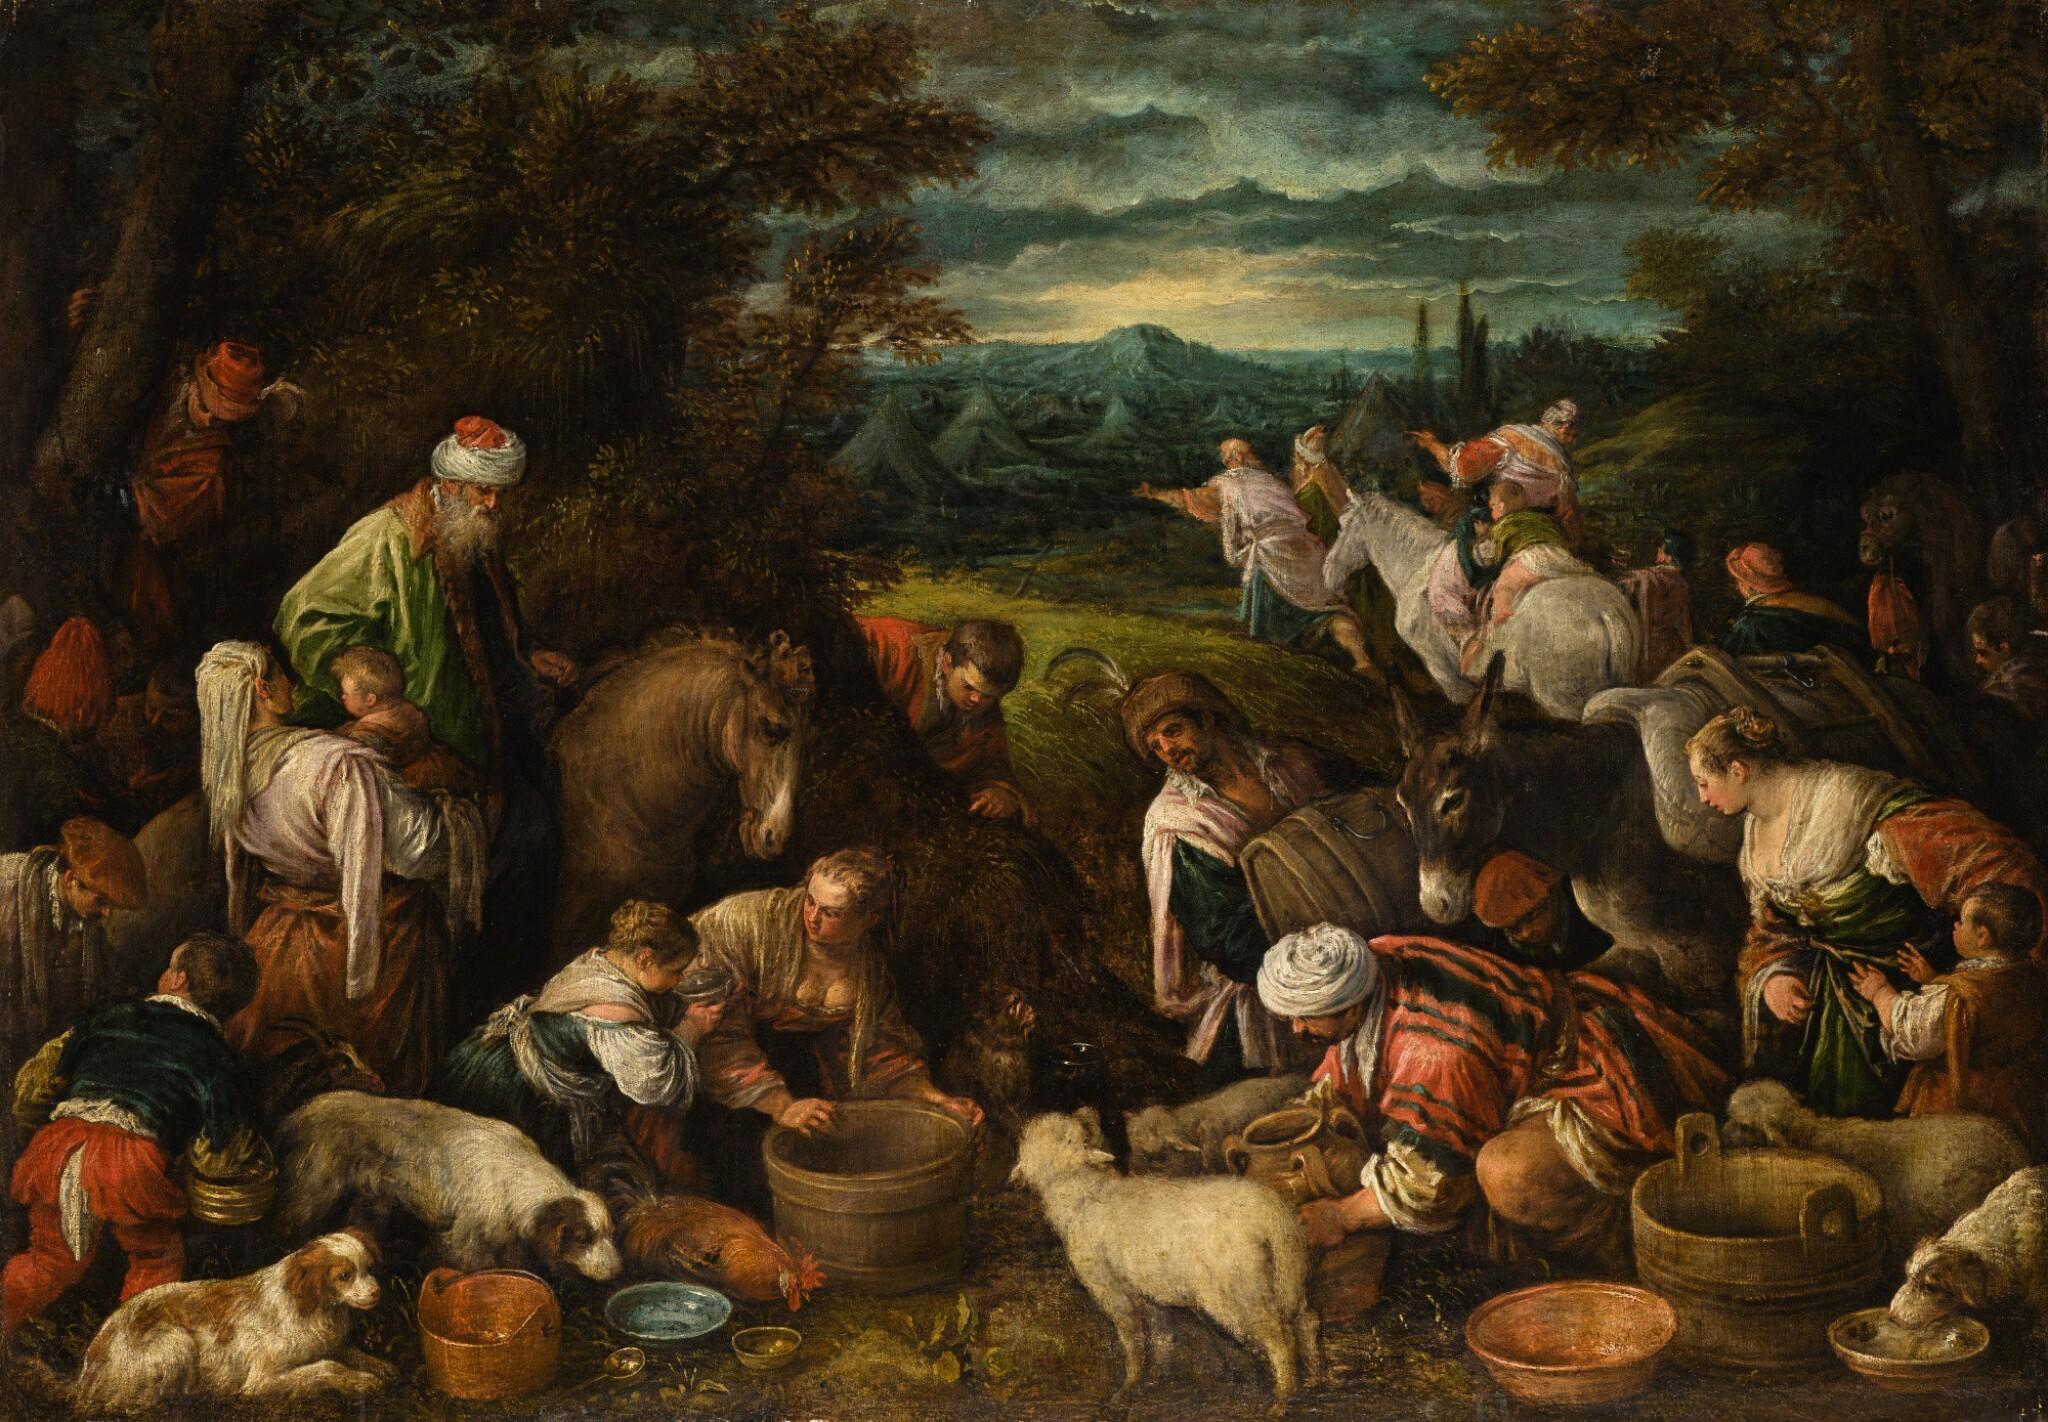 JACOPO DA PONTE, CALLED JACOPO BASSANO | The Israelites in the Wilderness | 雅各布・達・彭德 - 或稱雅各布・巴薩諾 |《曠野中的以色列人》